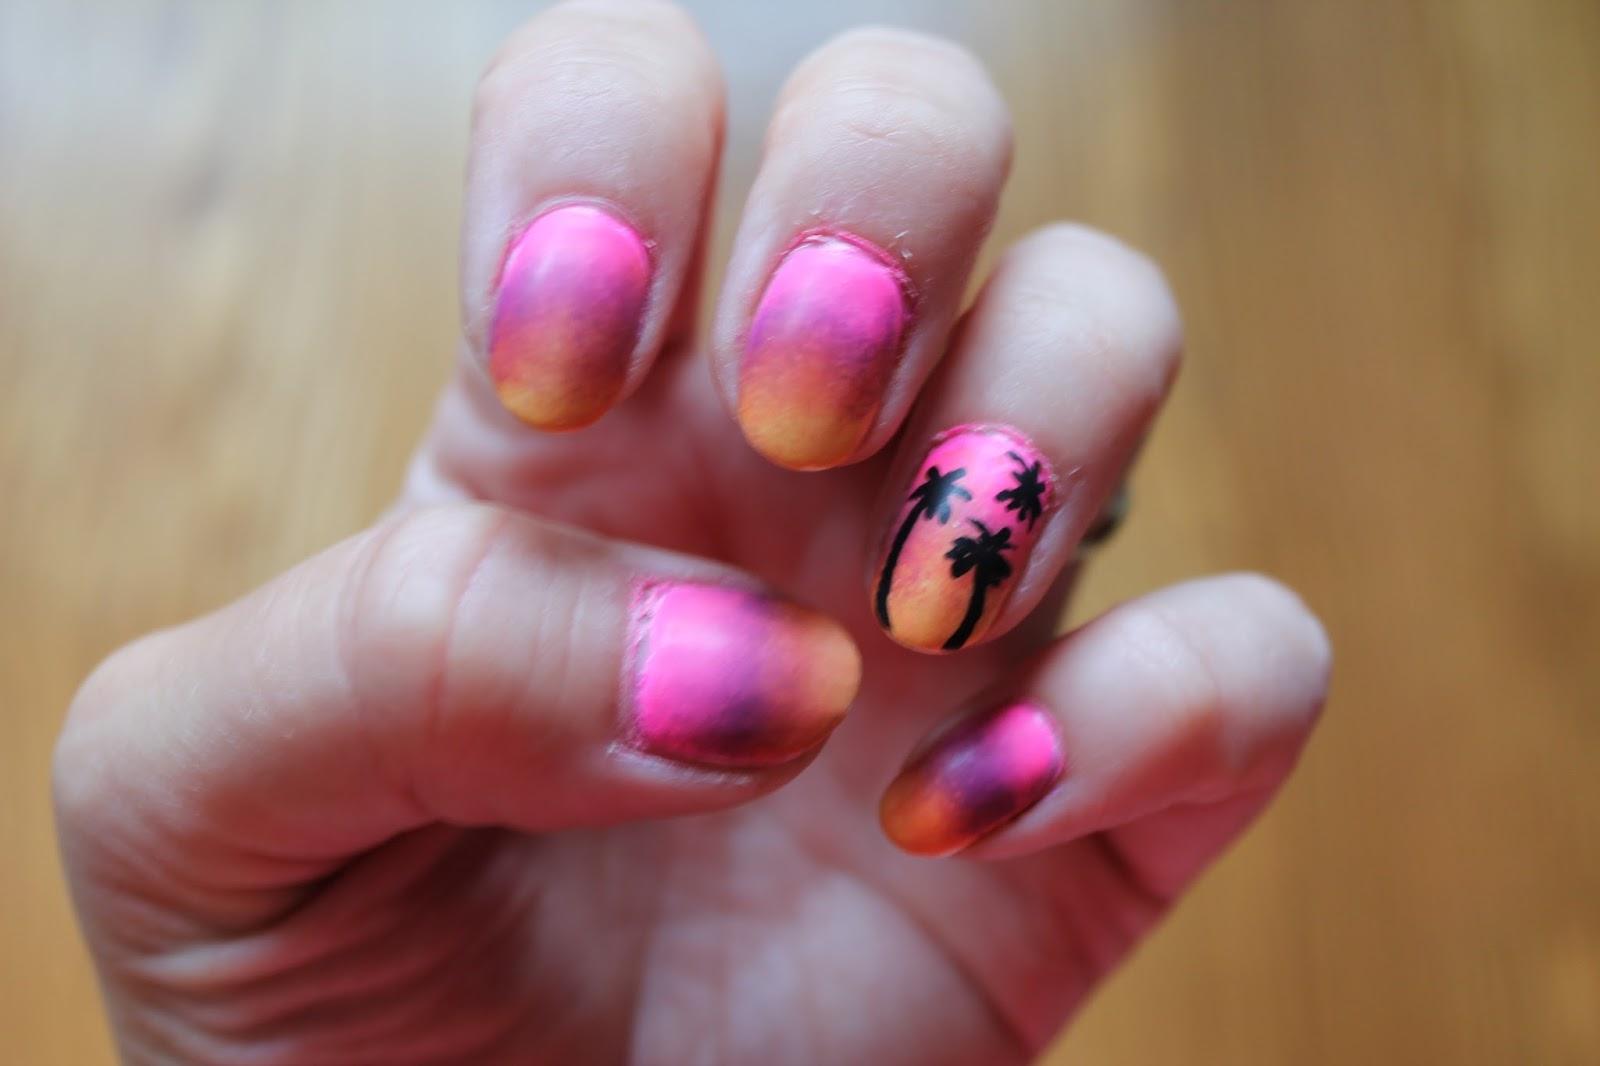 Island Nails - Jersey Girl, Texan Heart